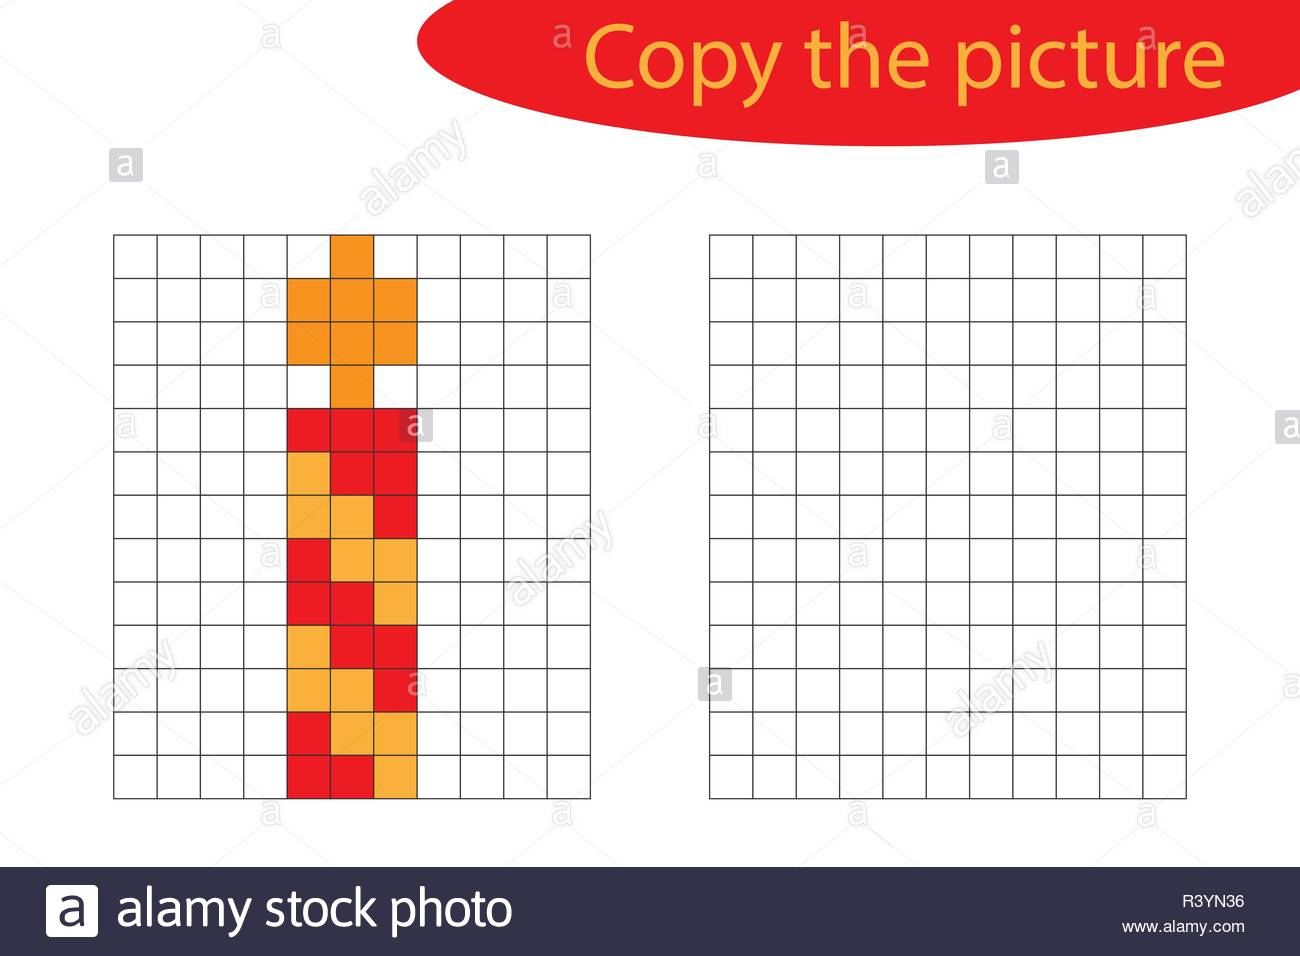 Copy The Picture, Pixel Art, Xmas Candle Cartoon, Drawing tout Pixel Art De Noël